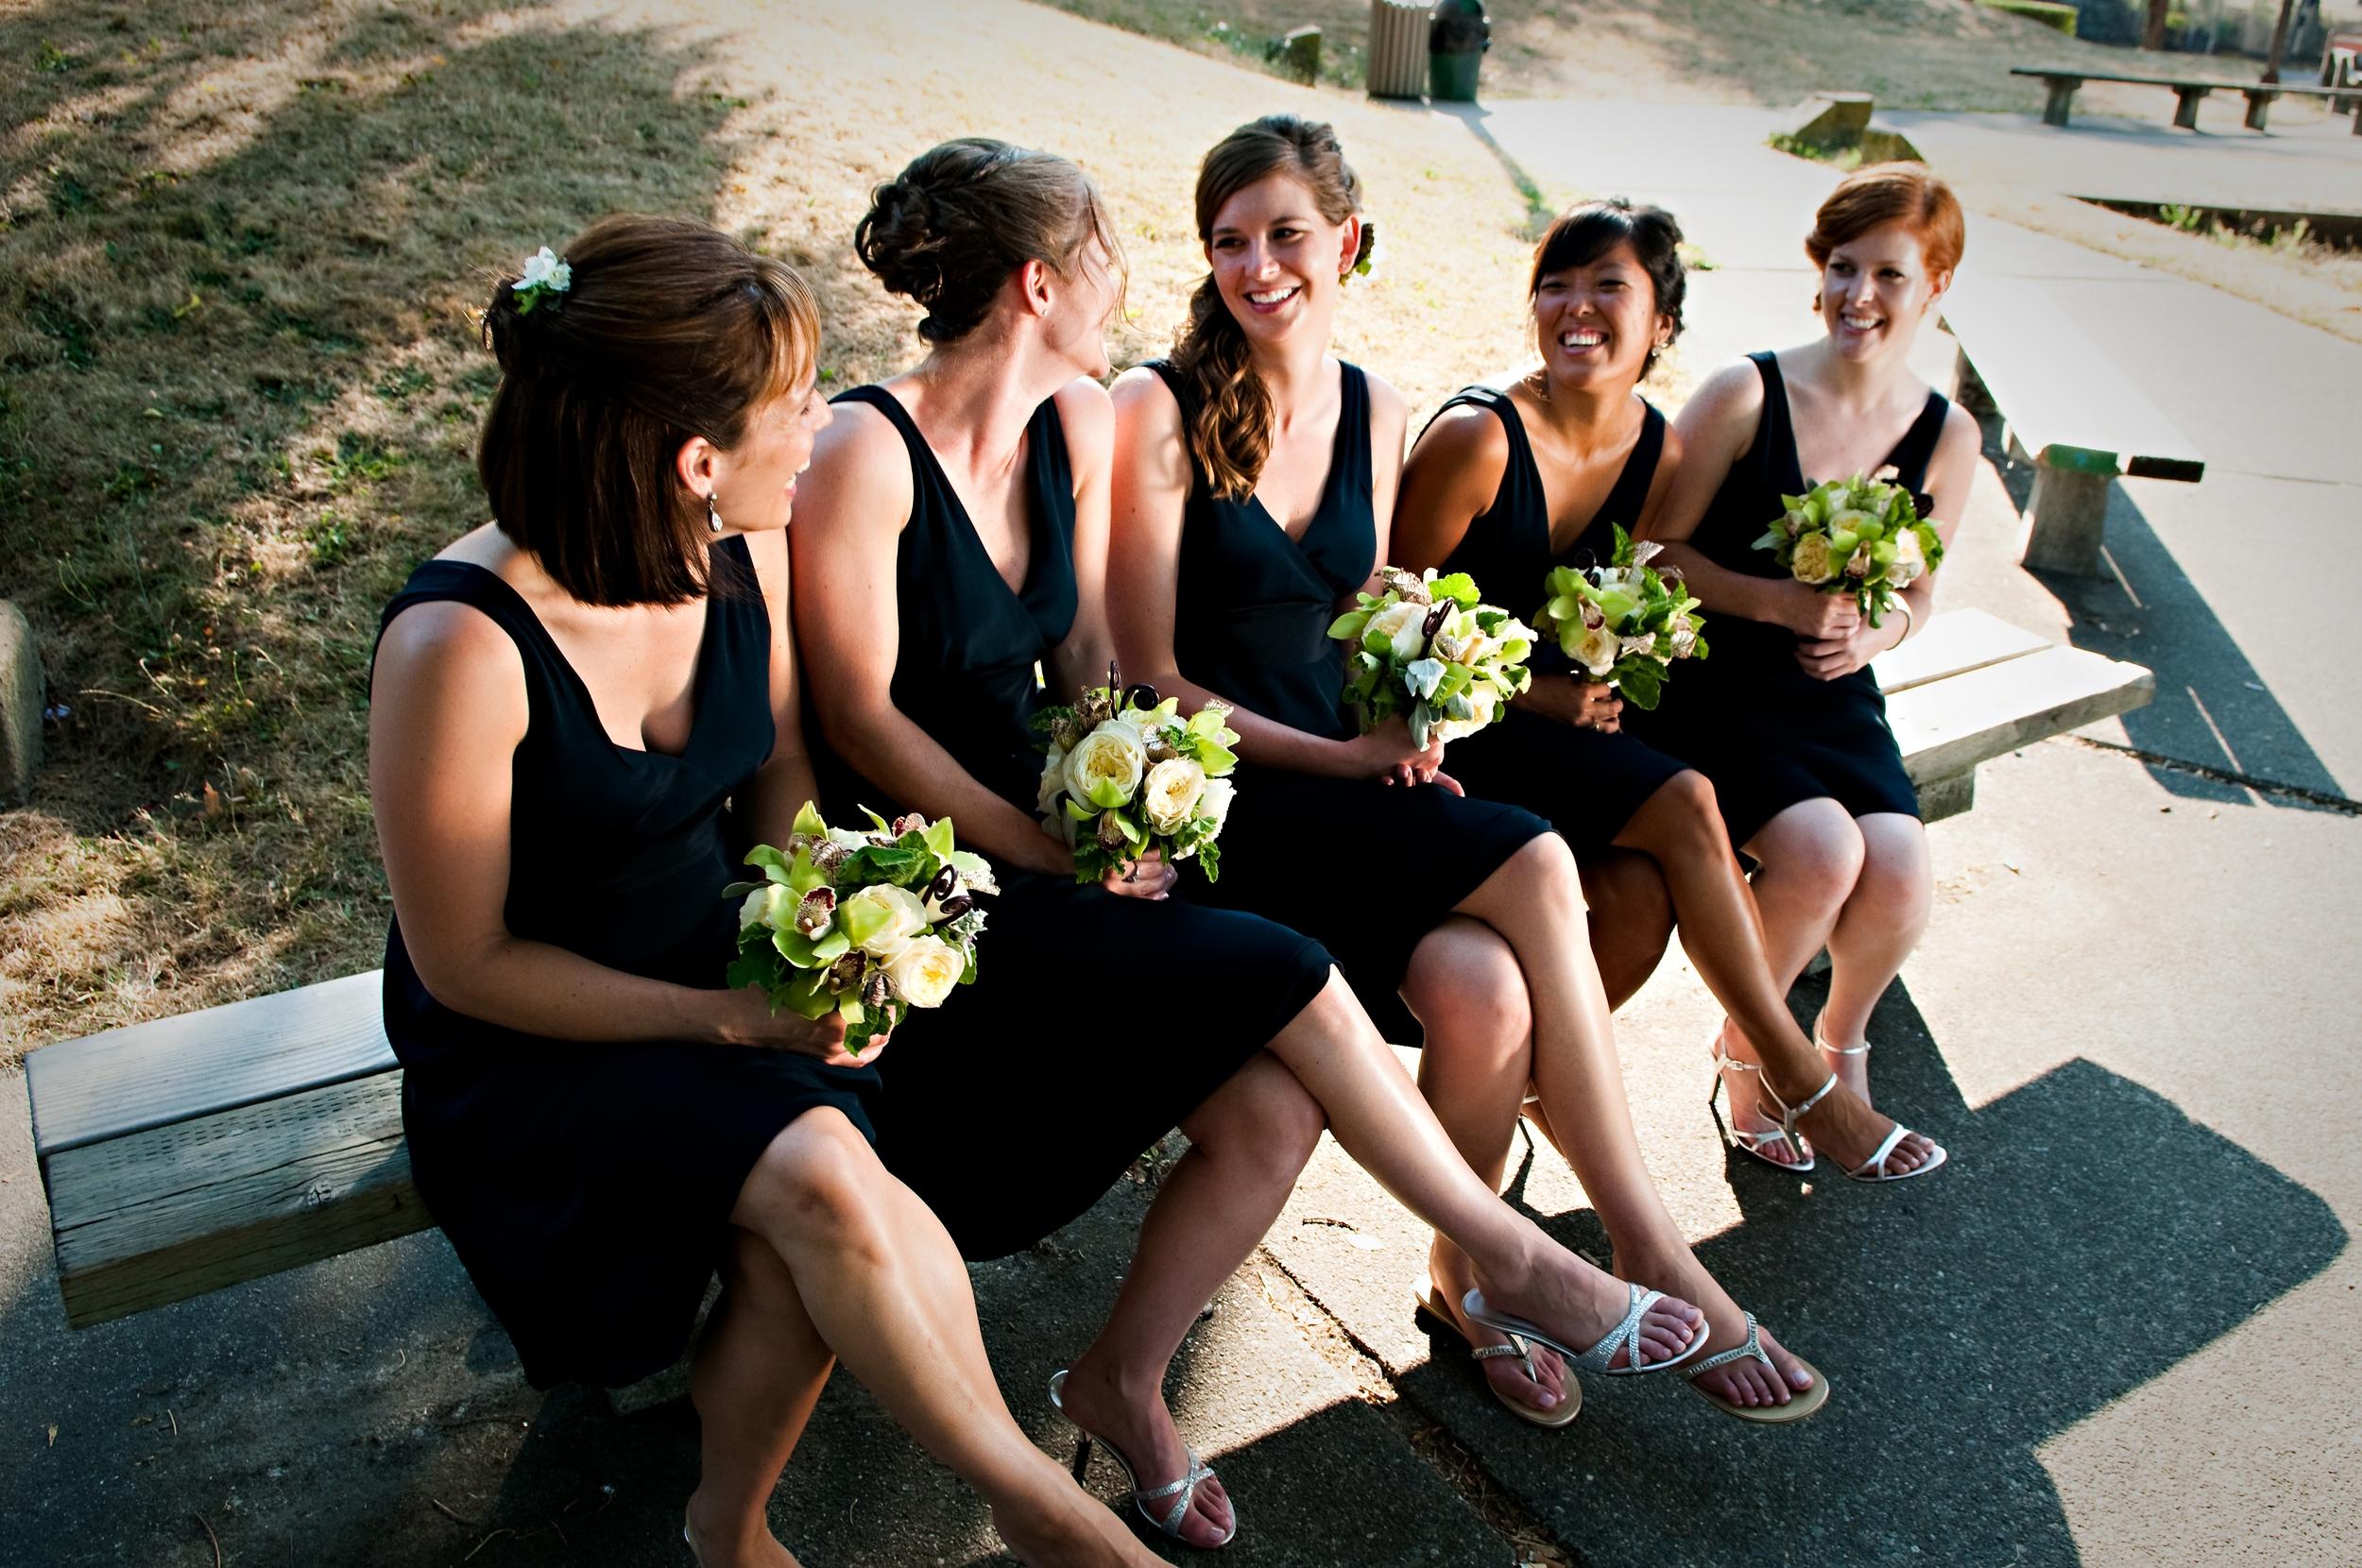 Rosie bridesmaids-1.jpg